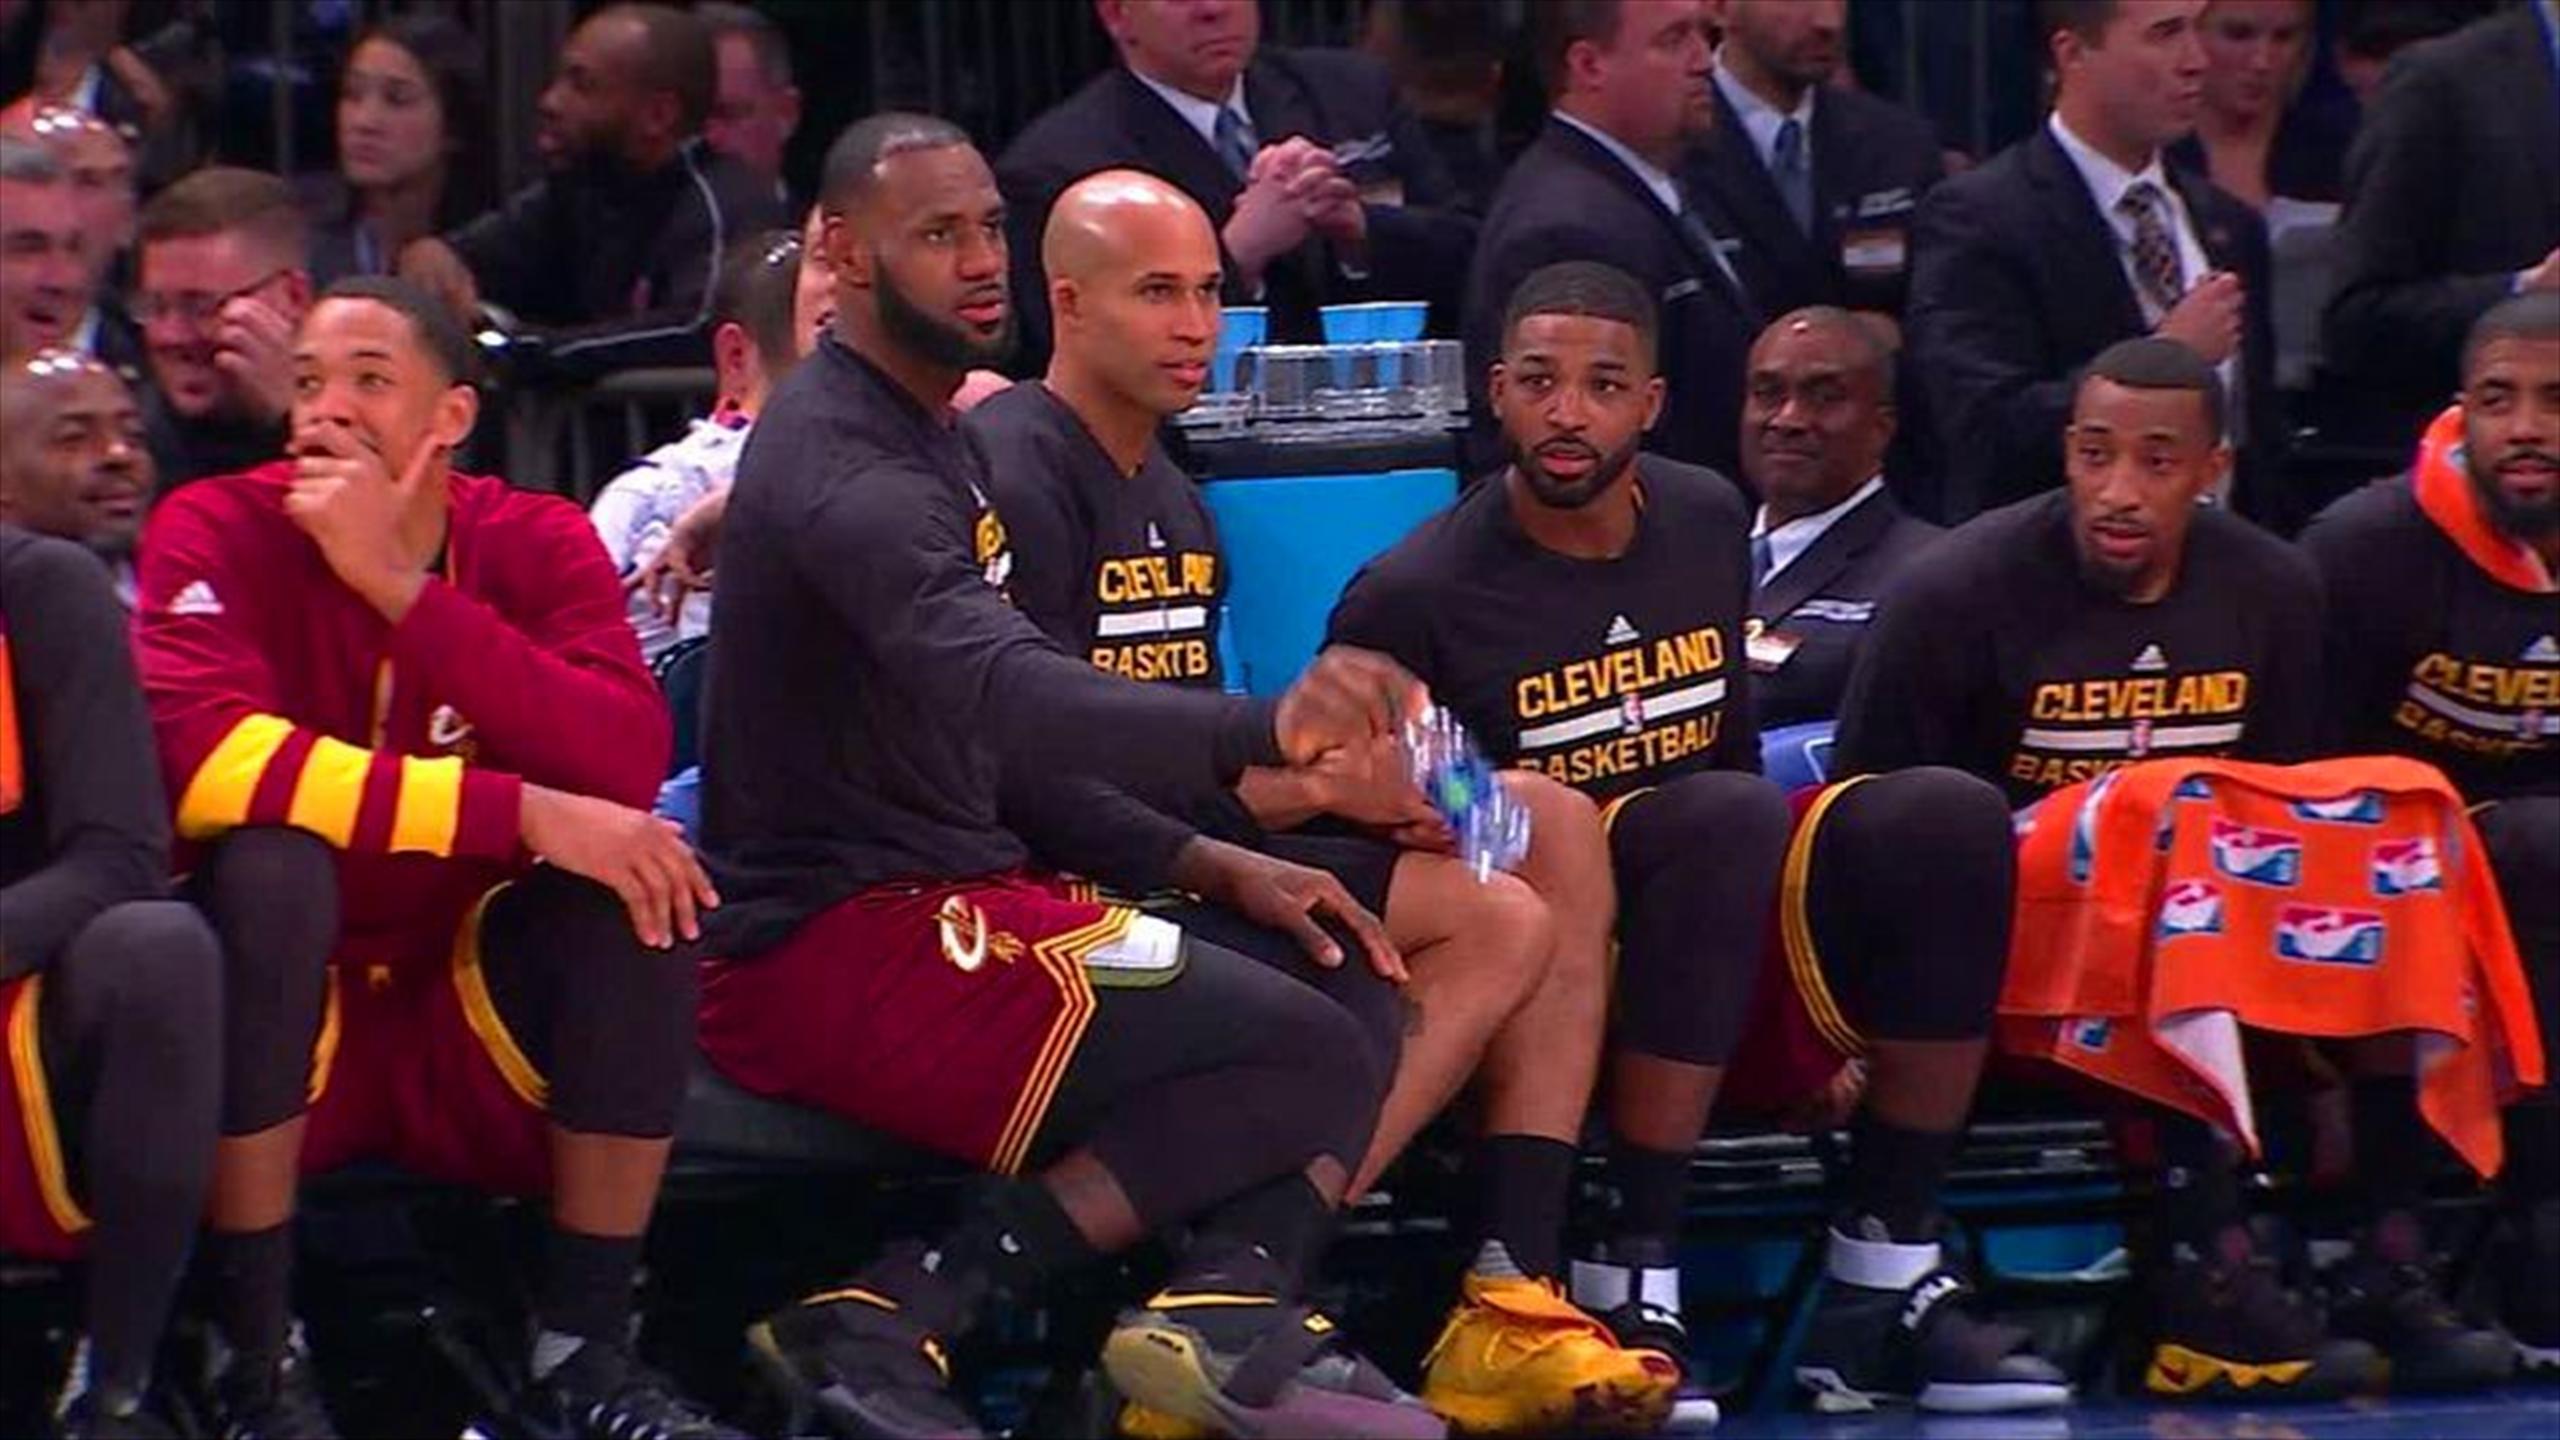 LeBron James' bottle-flip challenge goes badly DURING Cleveland Cavaliers game (Twitter)